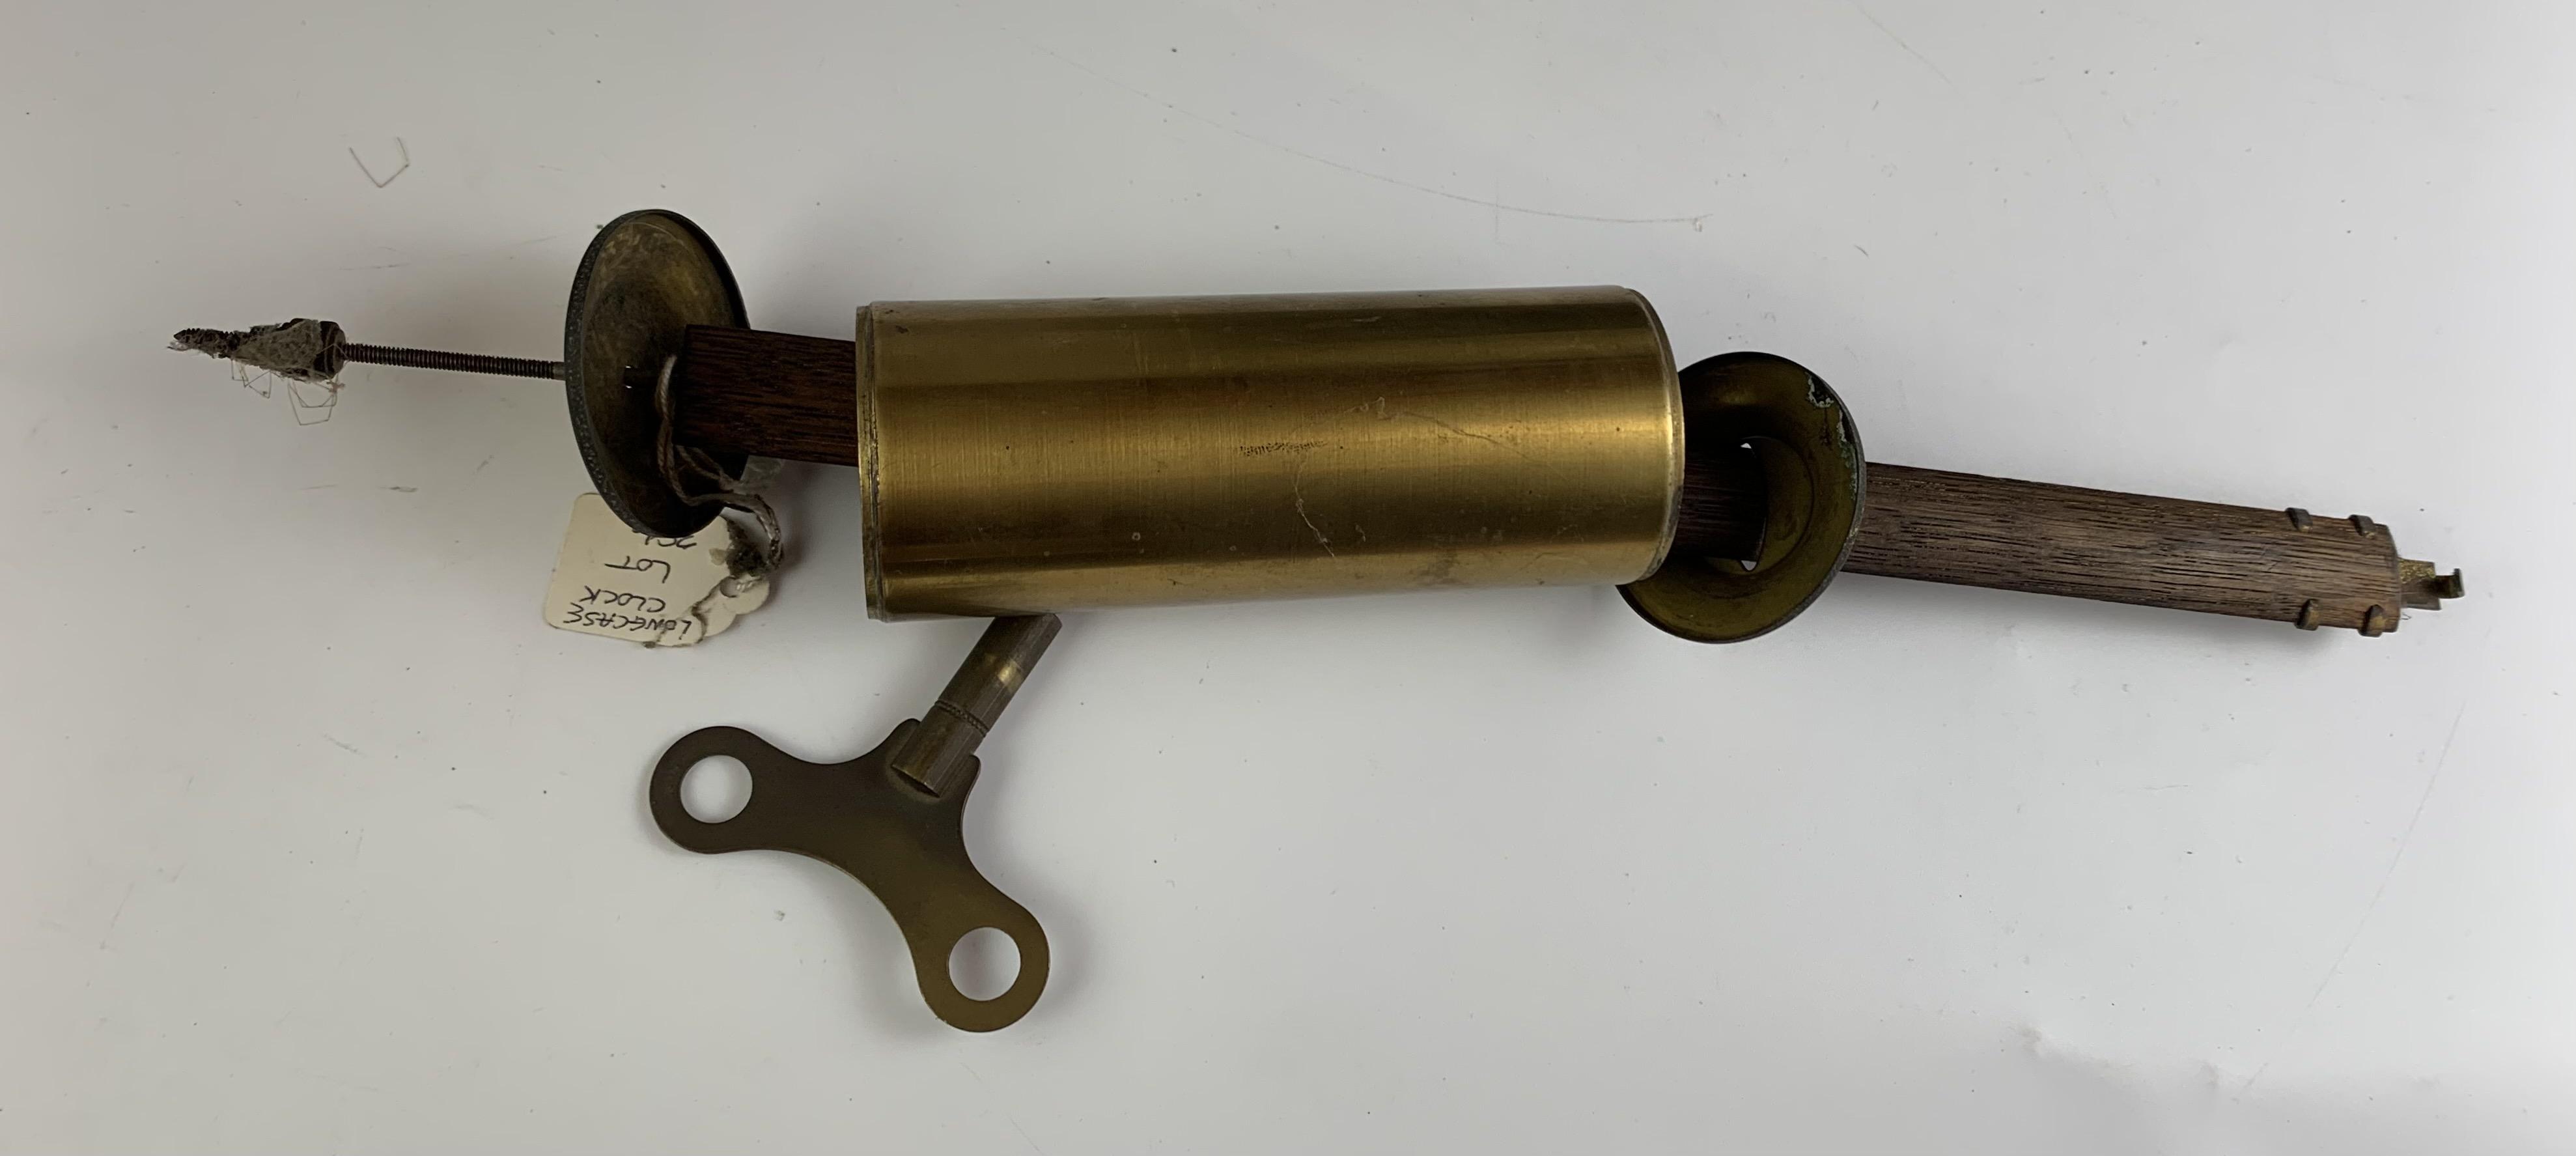 "Oak longcase grandmother clock with brass face, pendulum, key and single weight. Not working. 64"" - Image 8 of 9"